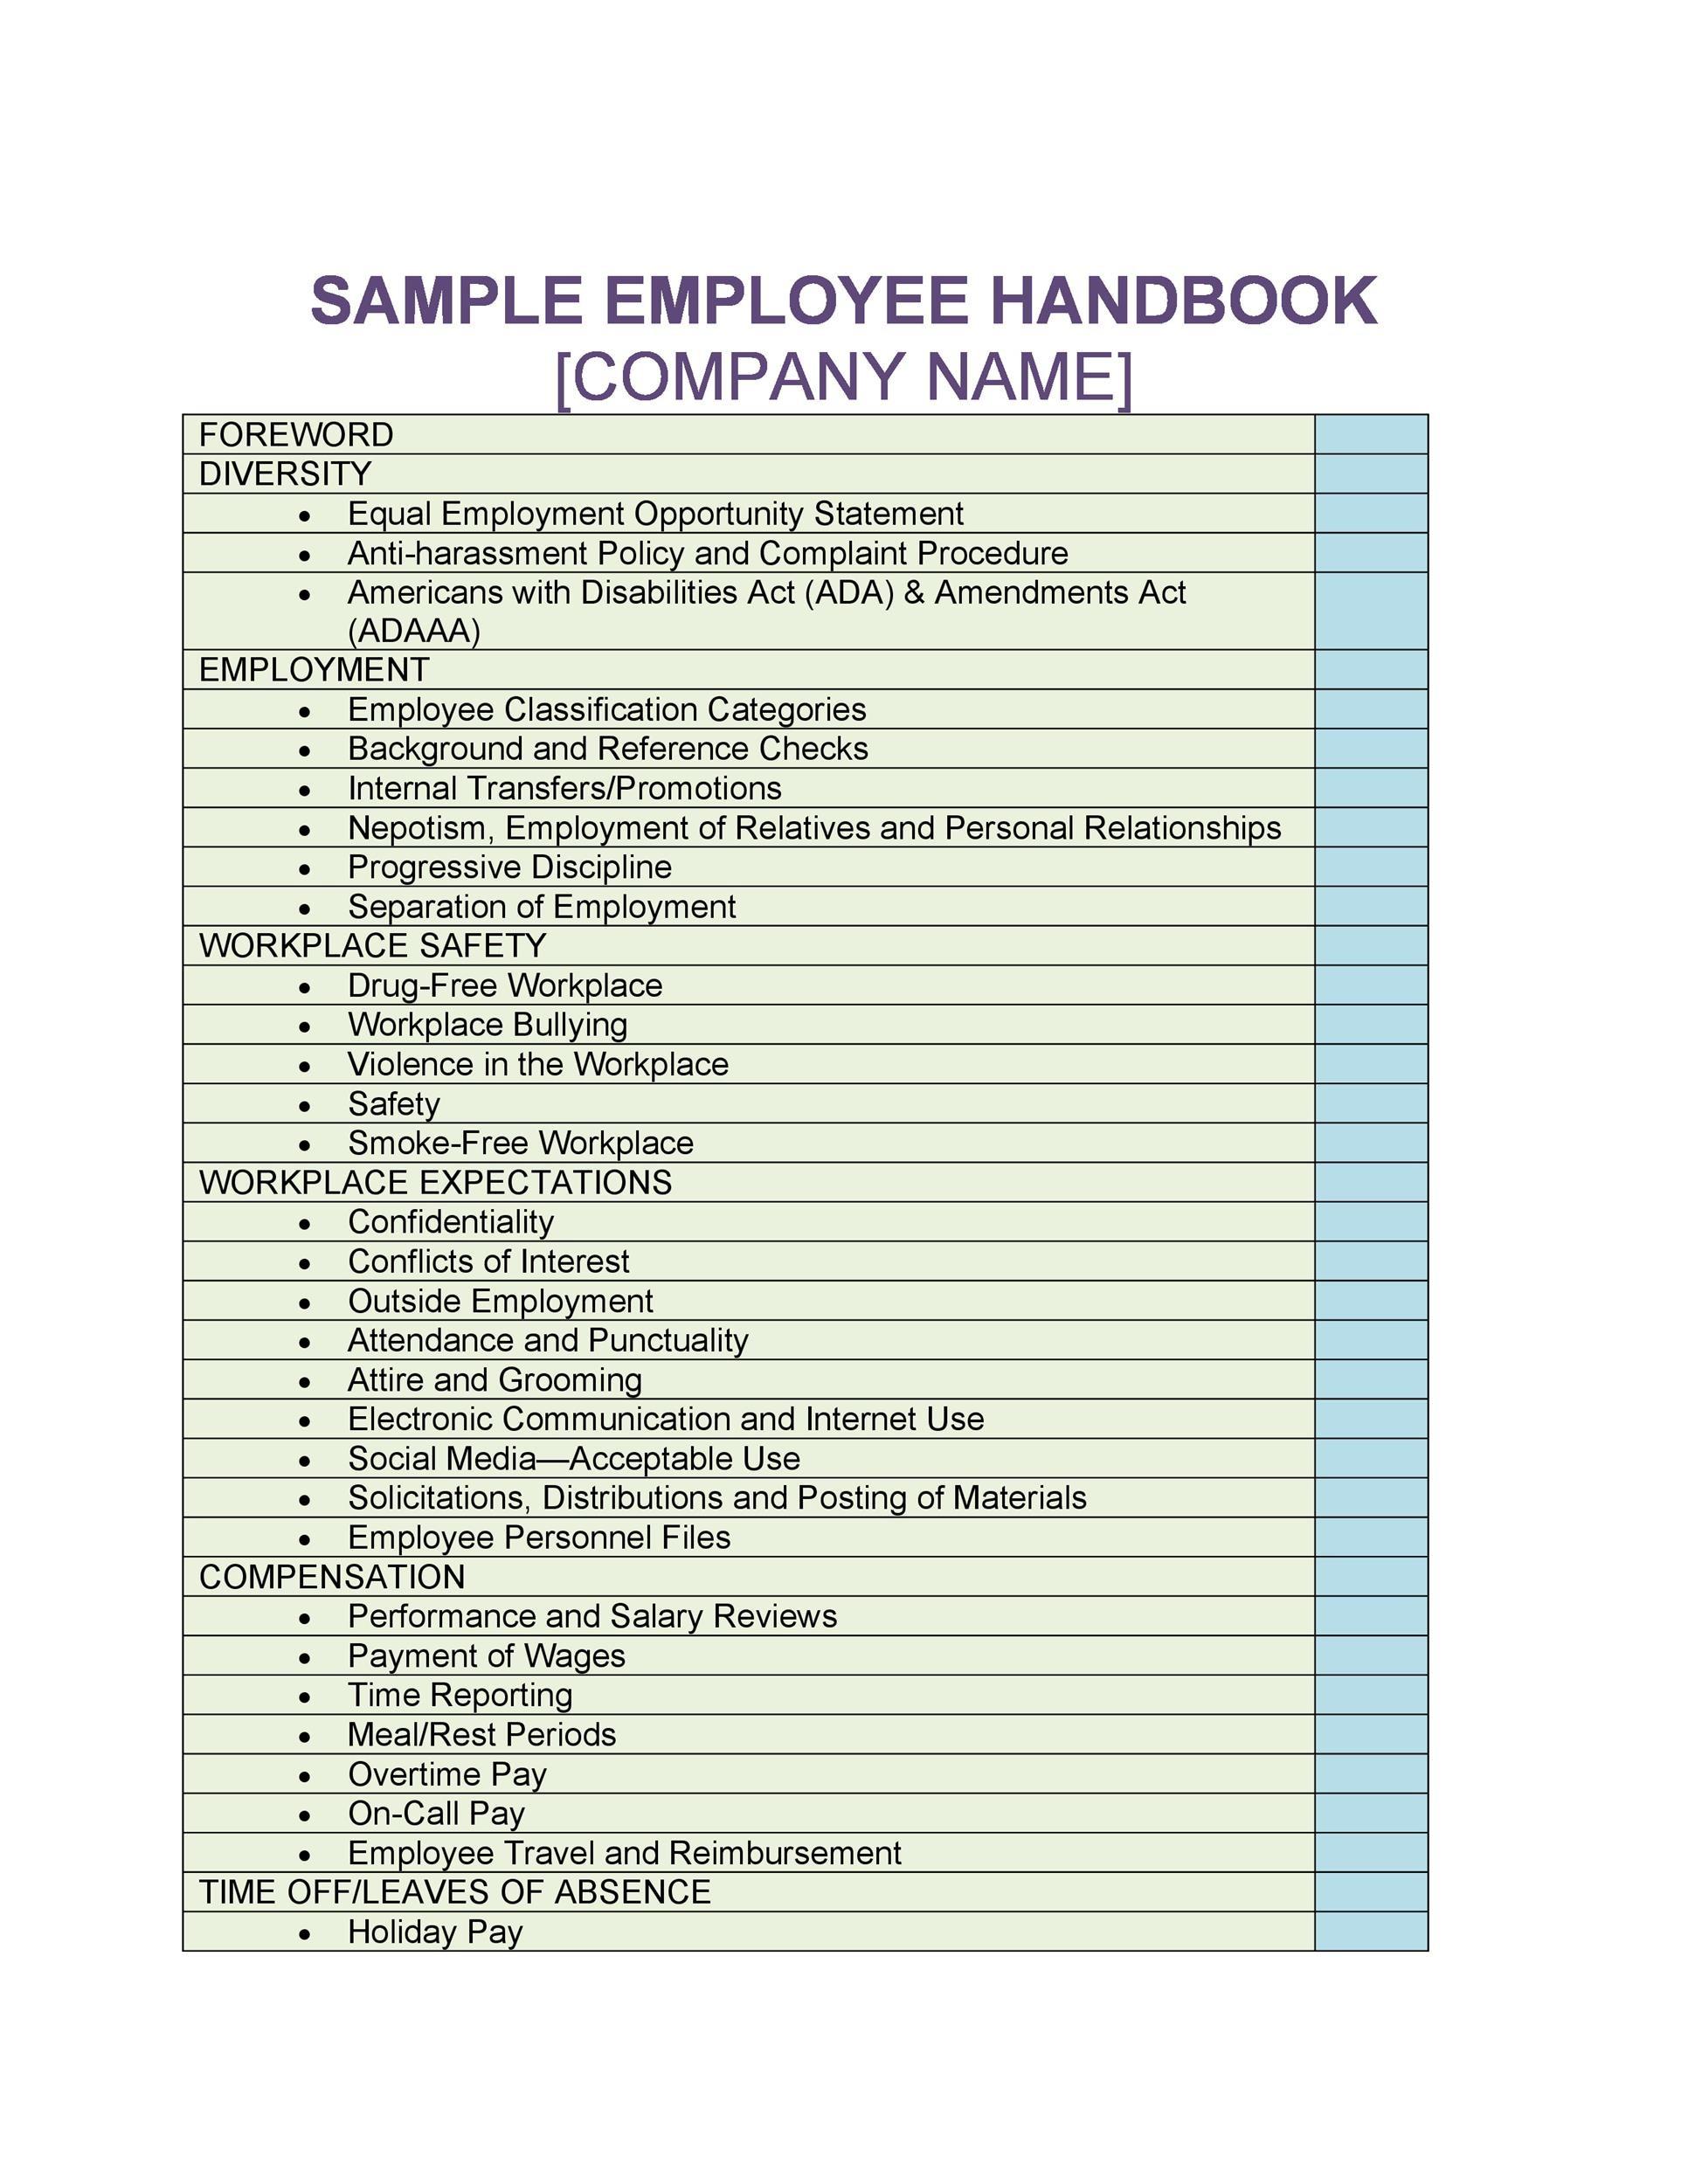 Free employee handbook template 27